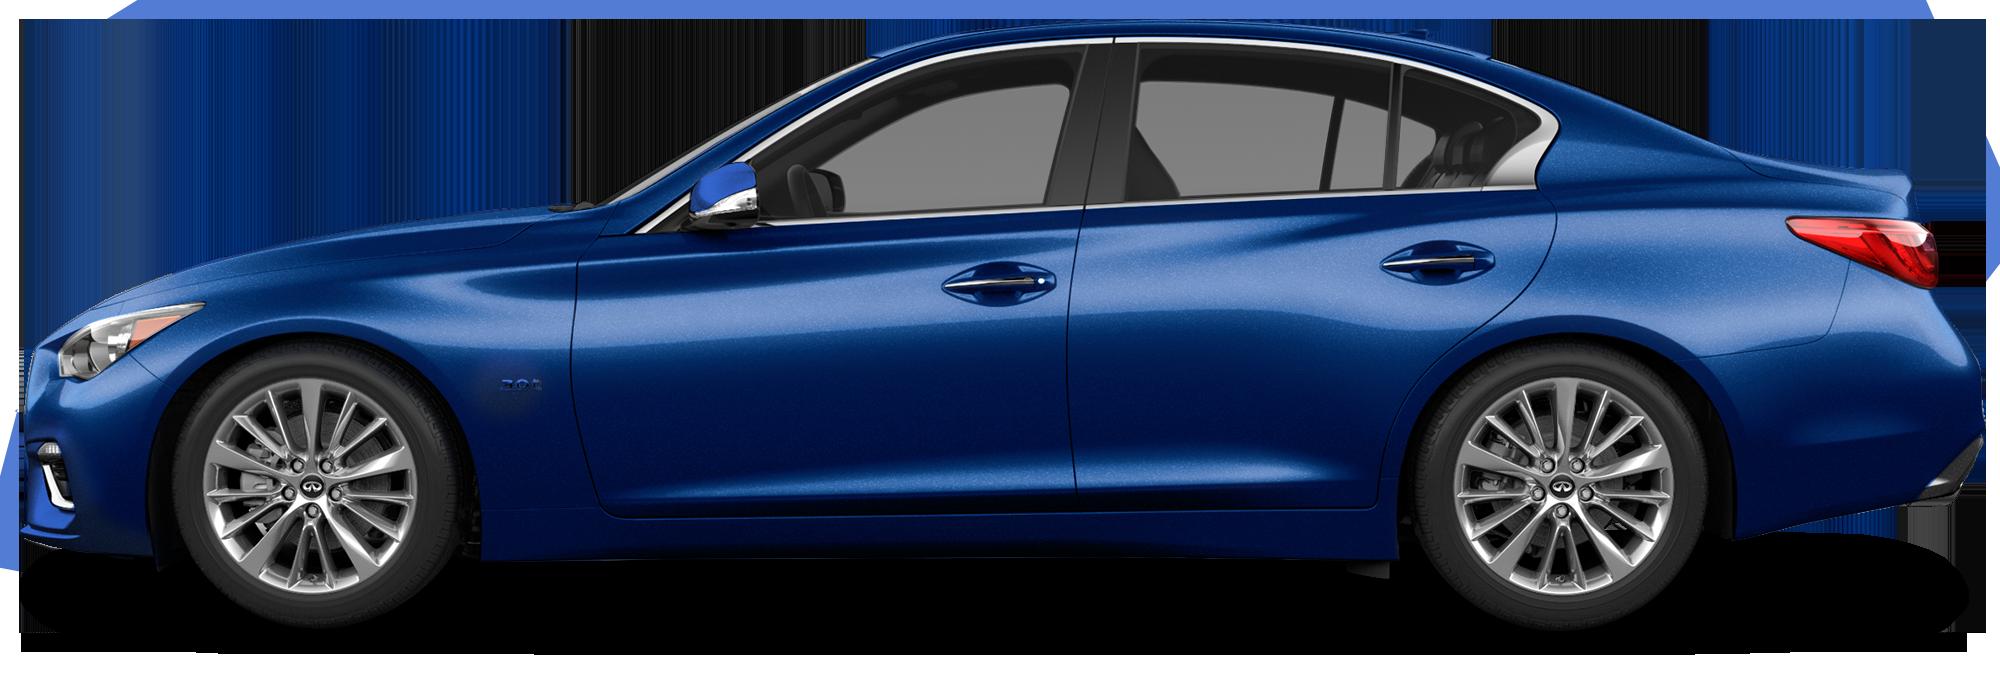 2021 INFINITI Q50 Sedan 3.0t LUXE